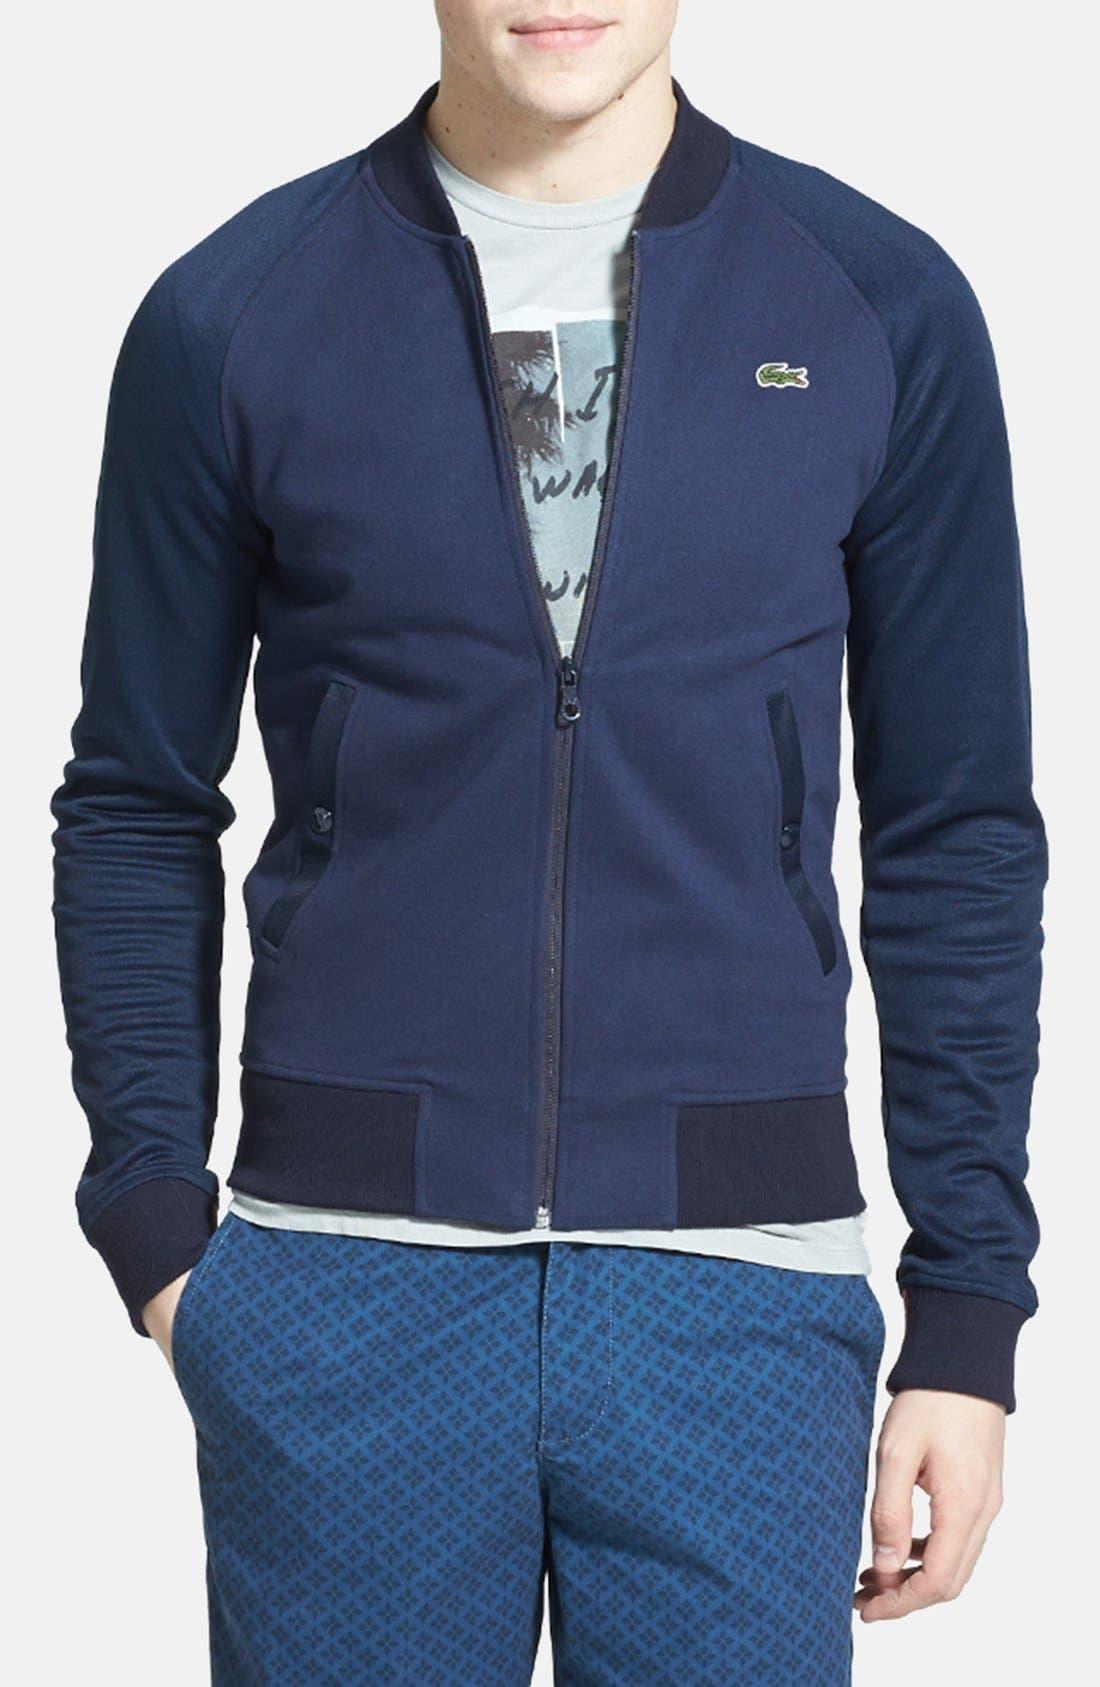 Main Image - Lacoste L!VE Zip Track Jacket